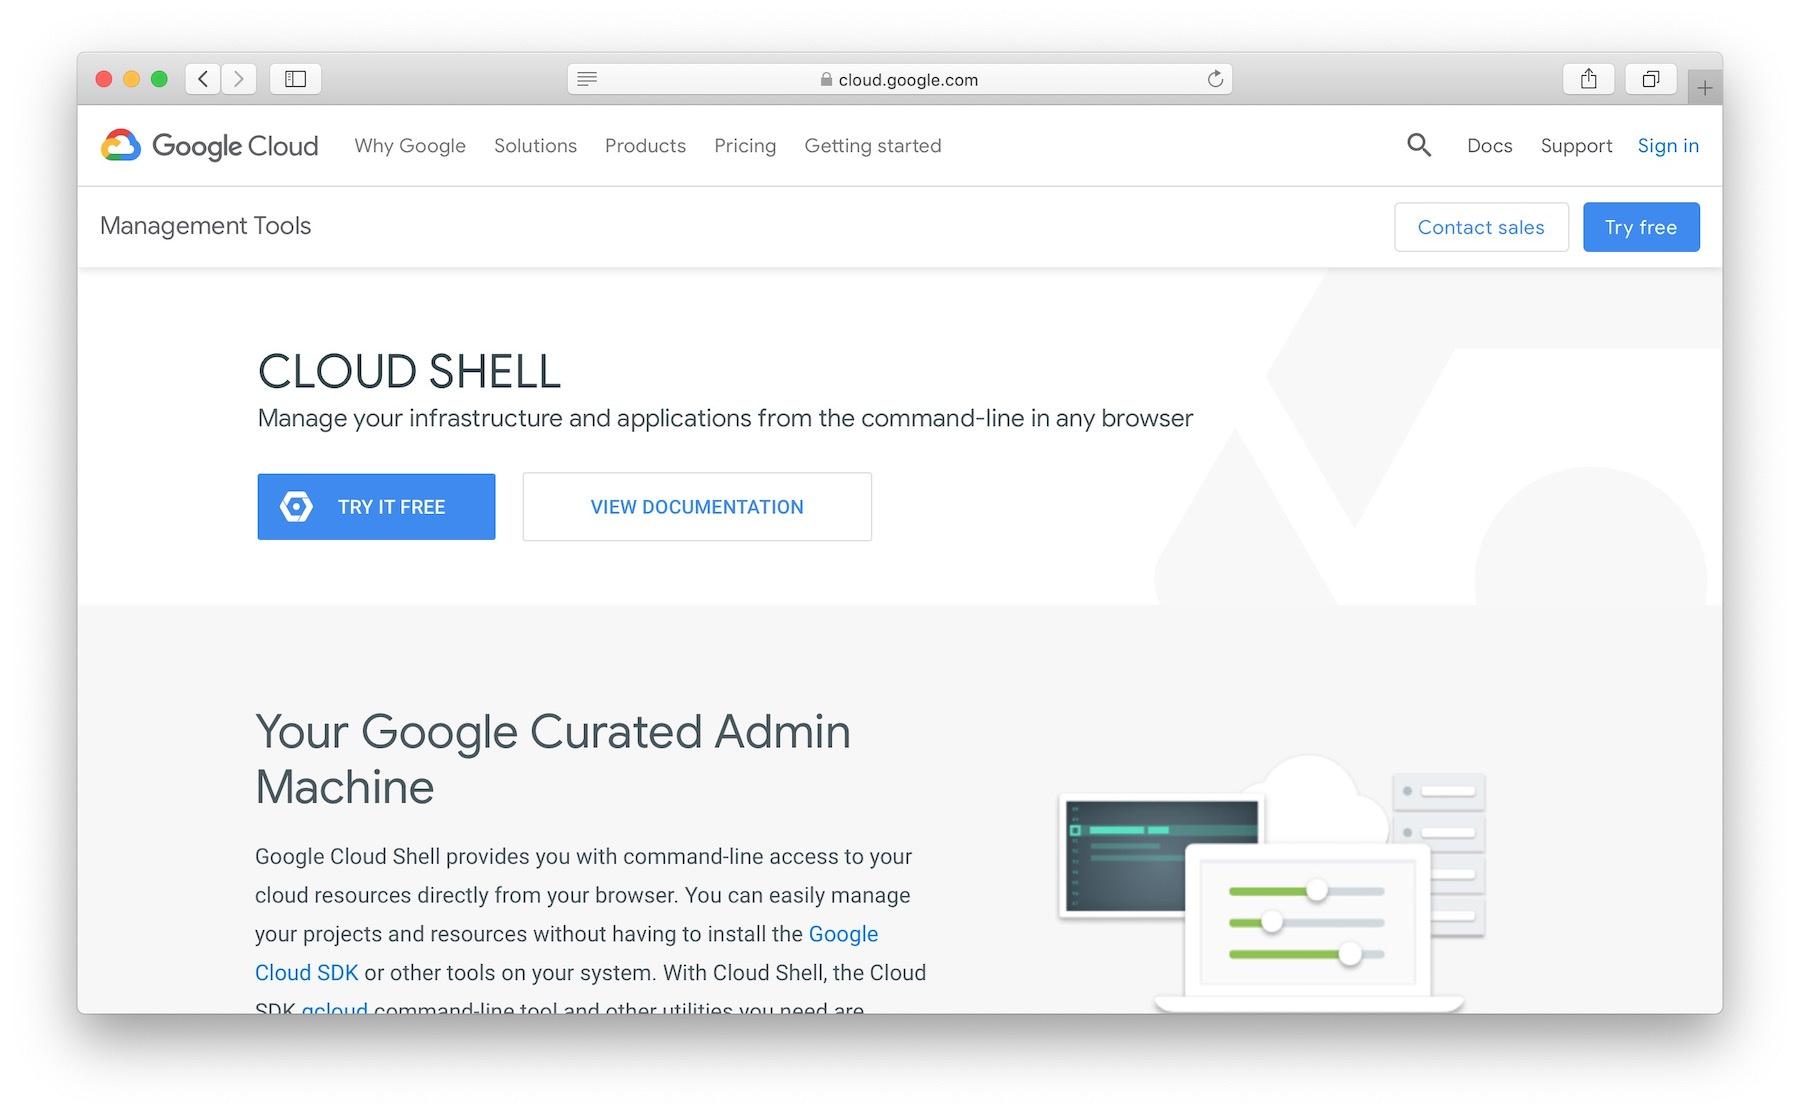 cloud.google